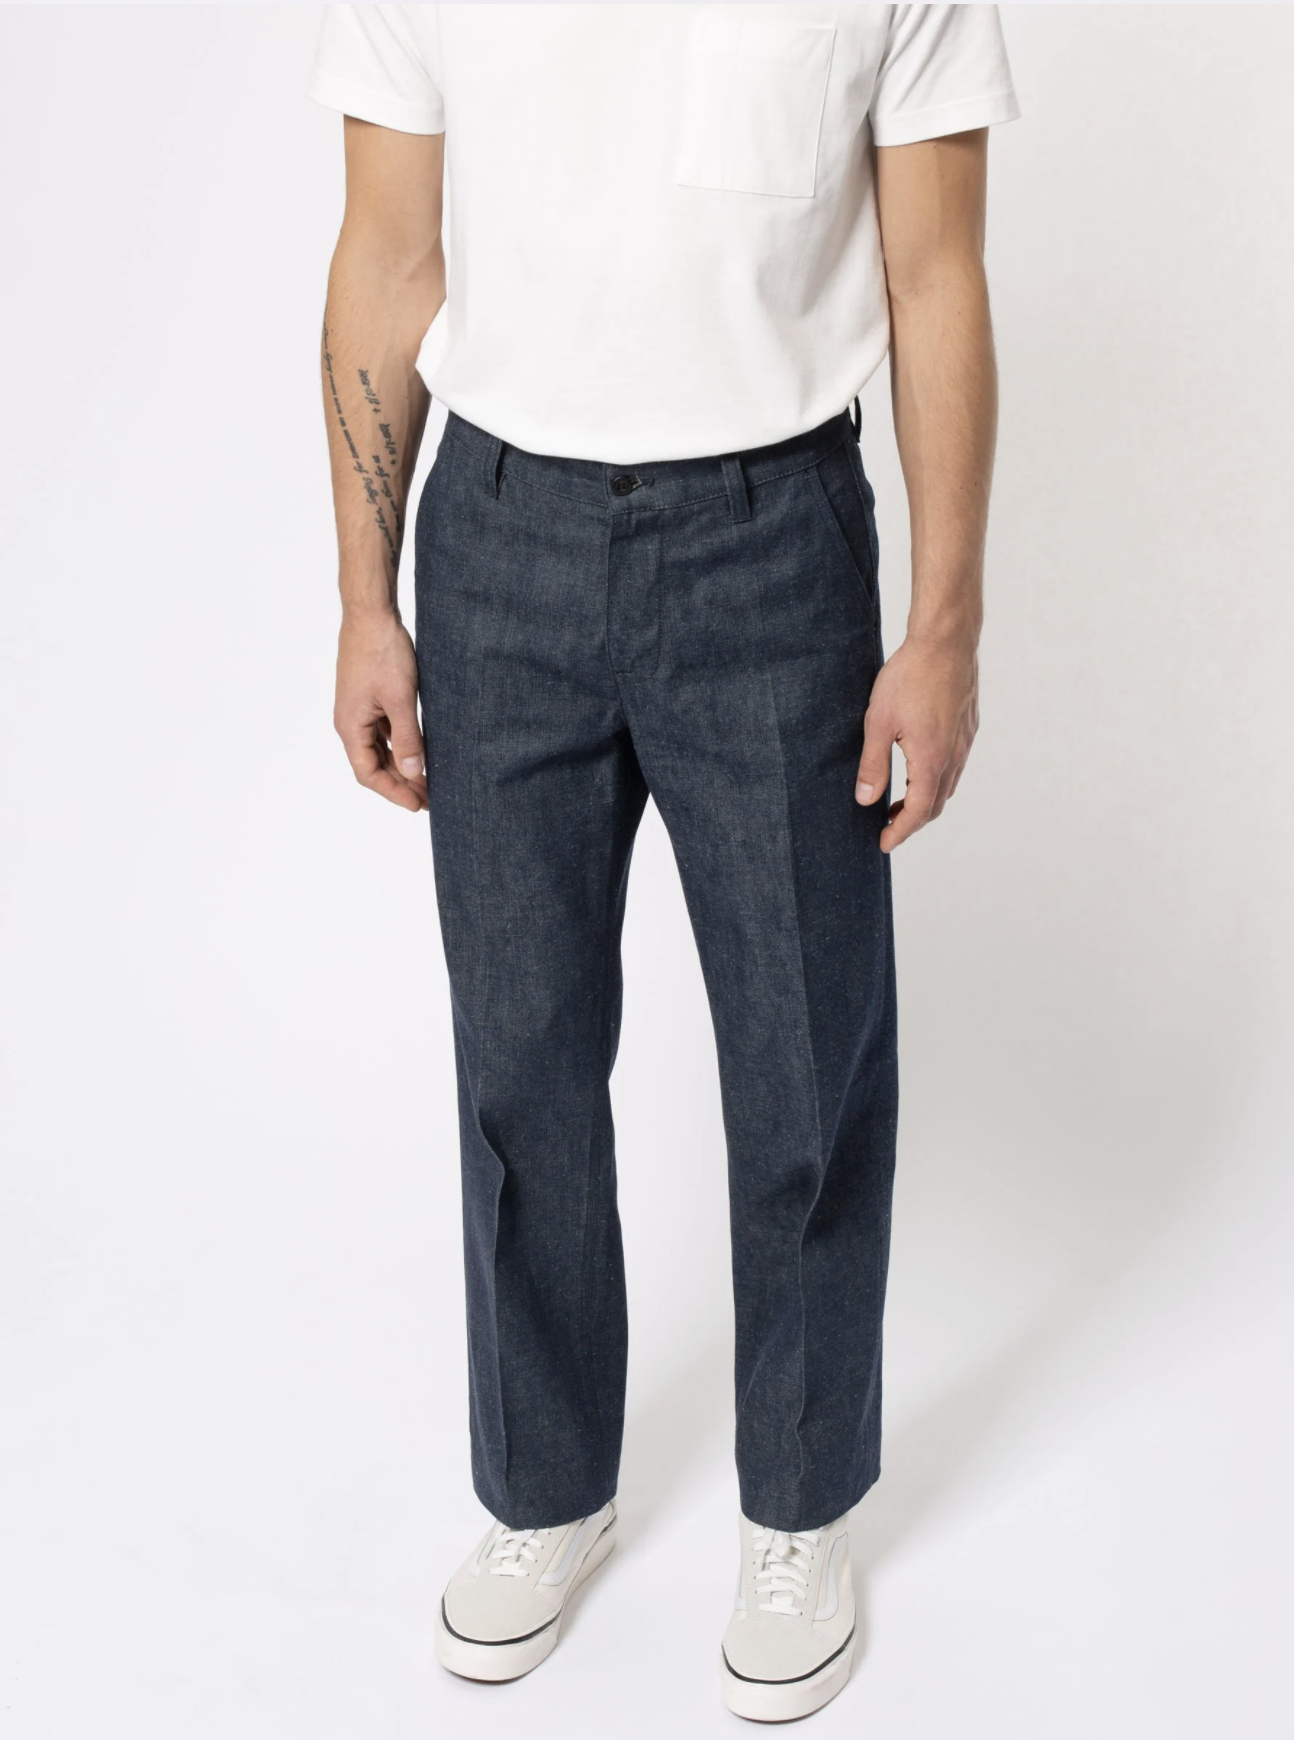 mespromenades-le-pantalon-dautmne-nudie-jeans-Lazy-Leo-Dry-Classic-Slub-120163-27_2400x2400-02